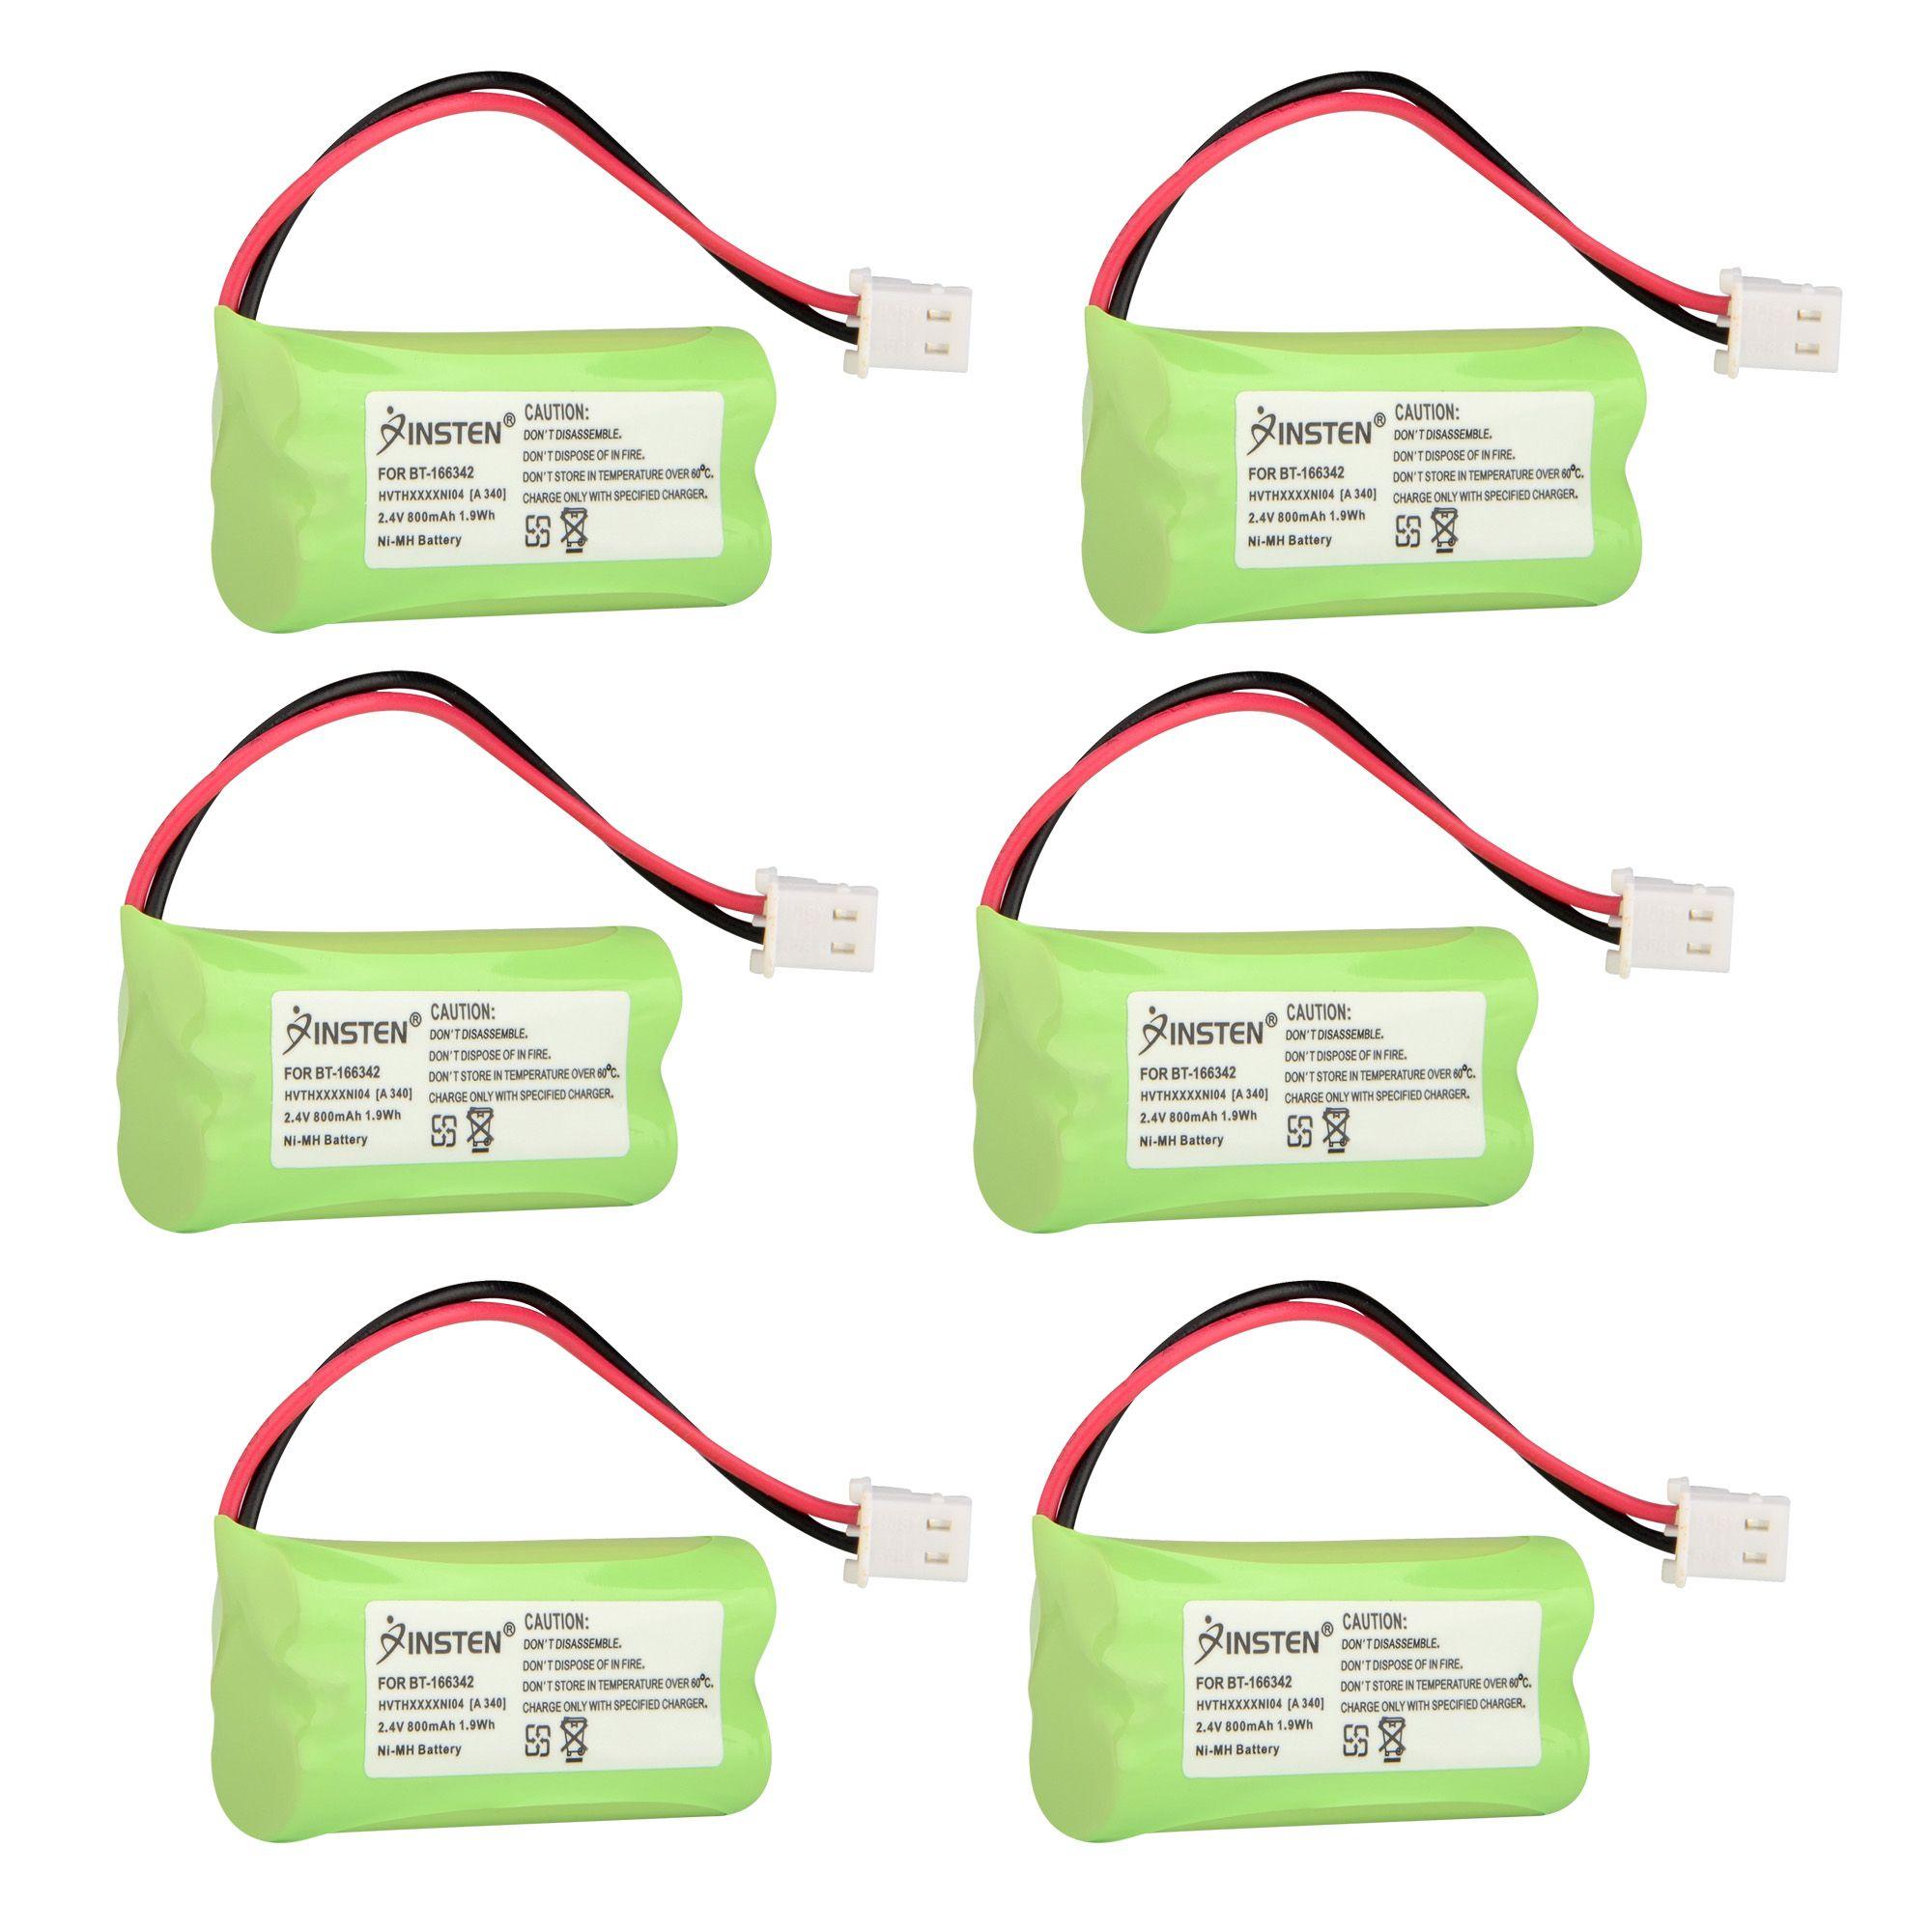 BT-183342 Battery by Insten for 6-pack 800mAh 2.4V NI-MH BT183342 BT283342 Replacement Battery for VTech DS6151 CS6429 CS6114 LS6475-3 CS6419-2 CS6519-2 DS6521-2 AT&T TL86109 Cordless Phones